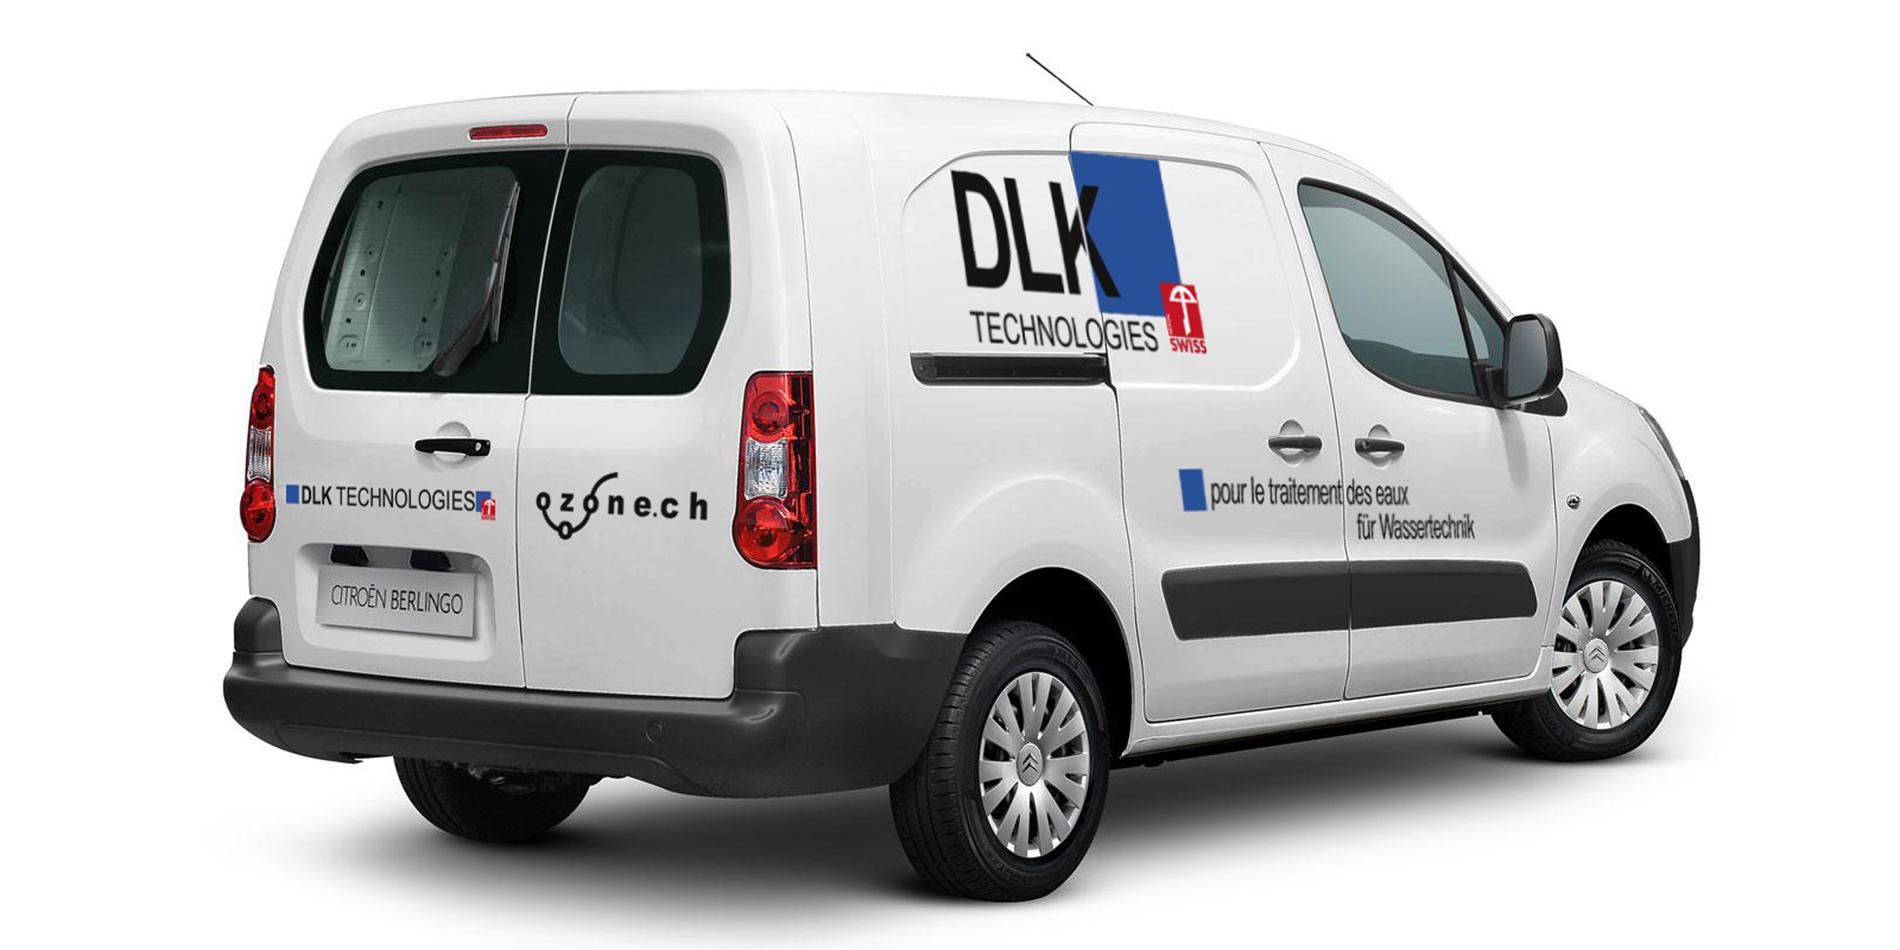 DLK - B12communication, communication et graphisme